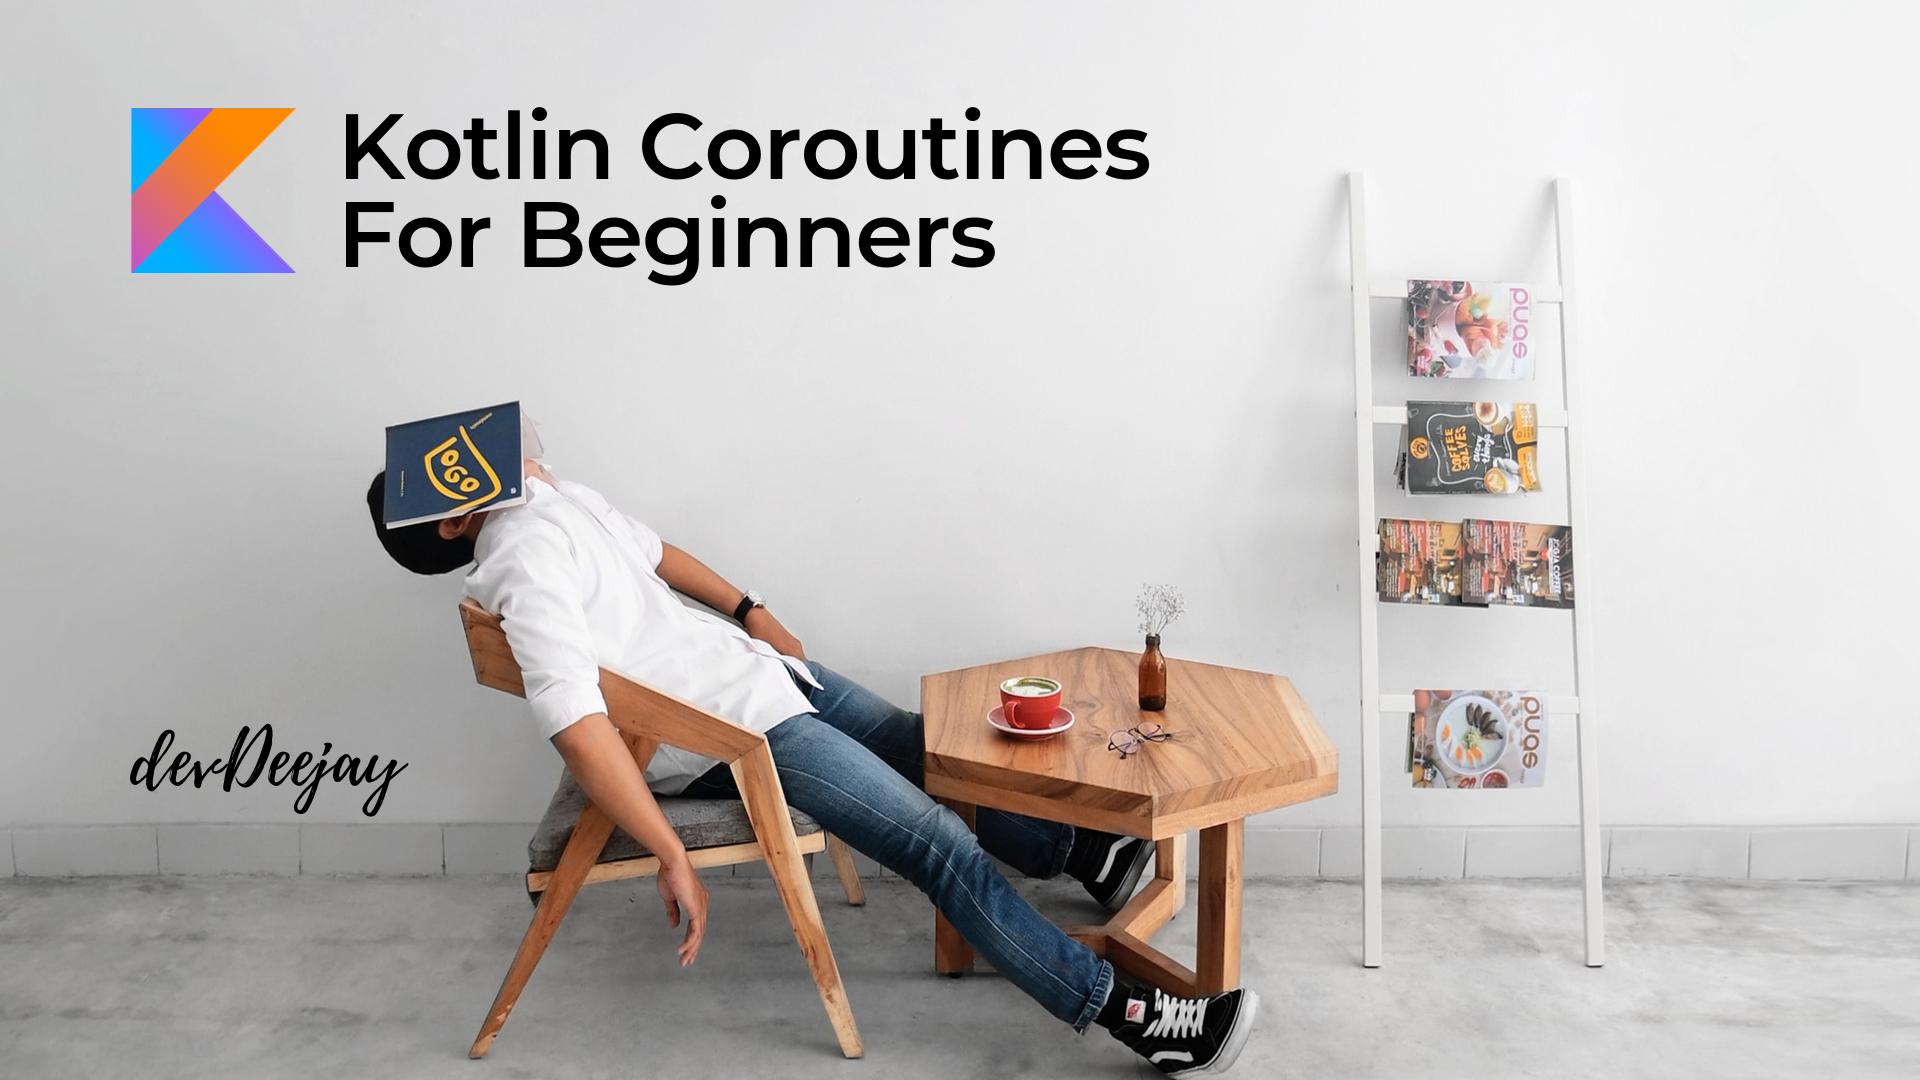 Part 1 Kotlin Coroutines For Beginners